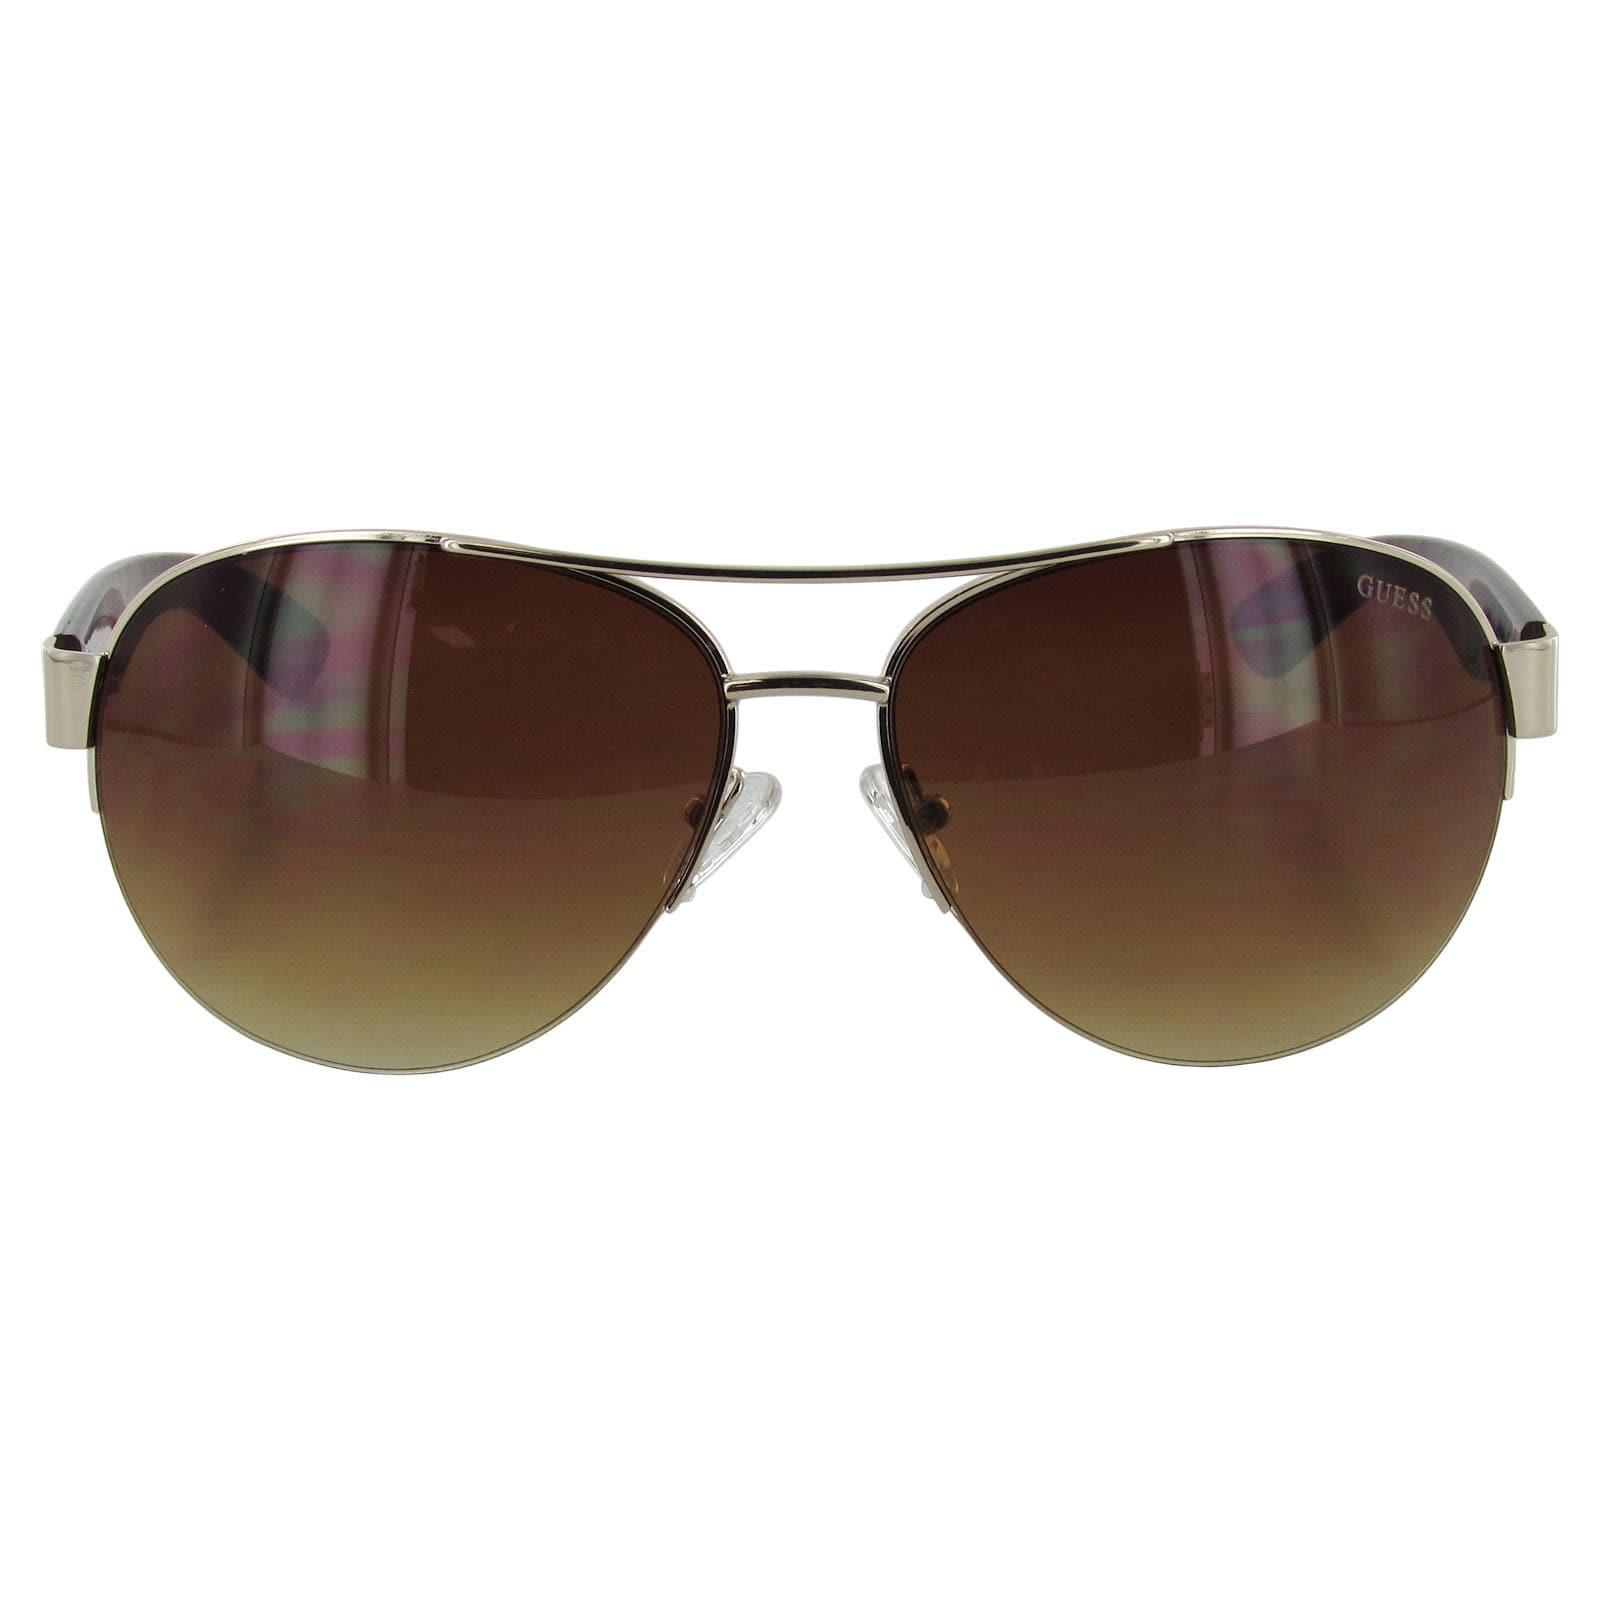 Guess Sunglasses Gf 0288 | CINEMAS 93